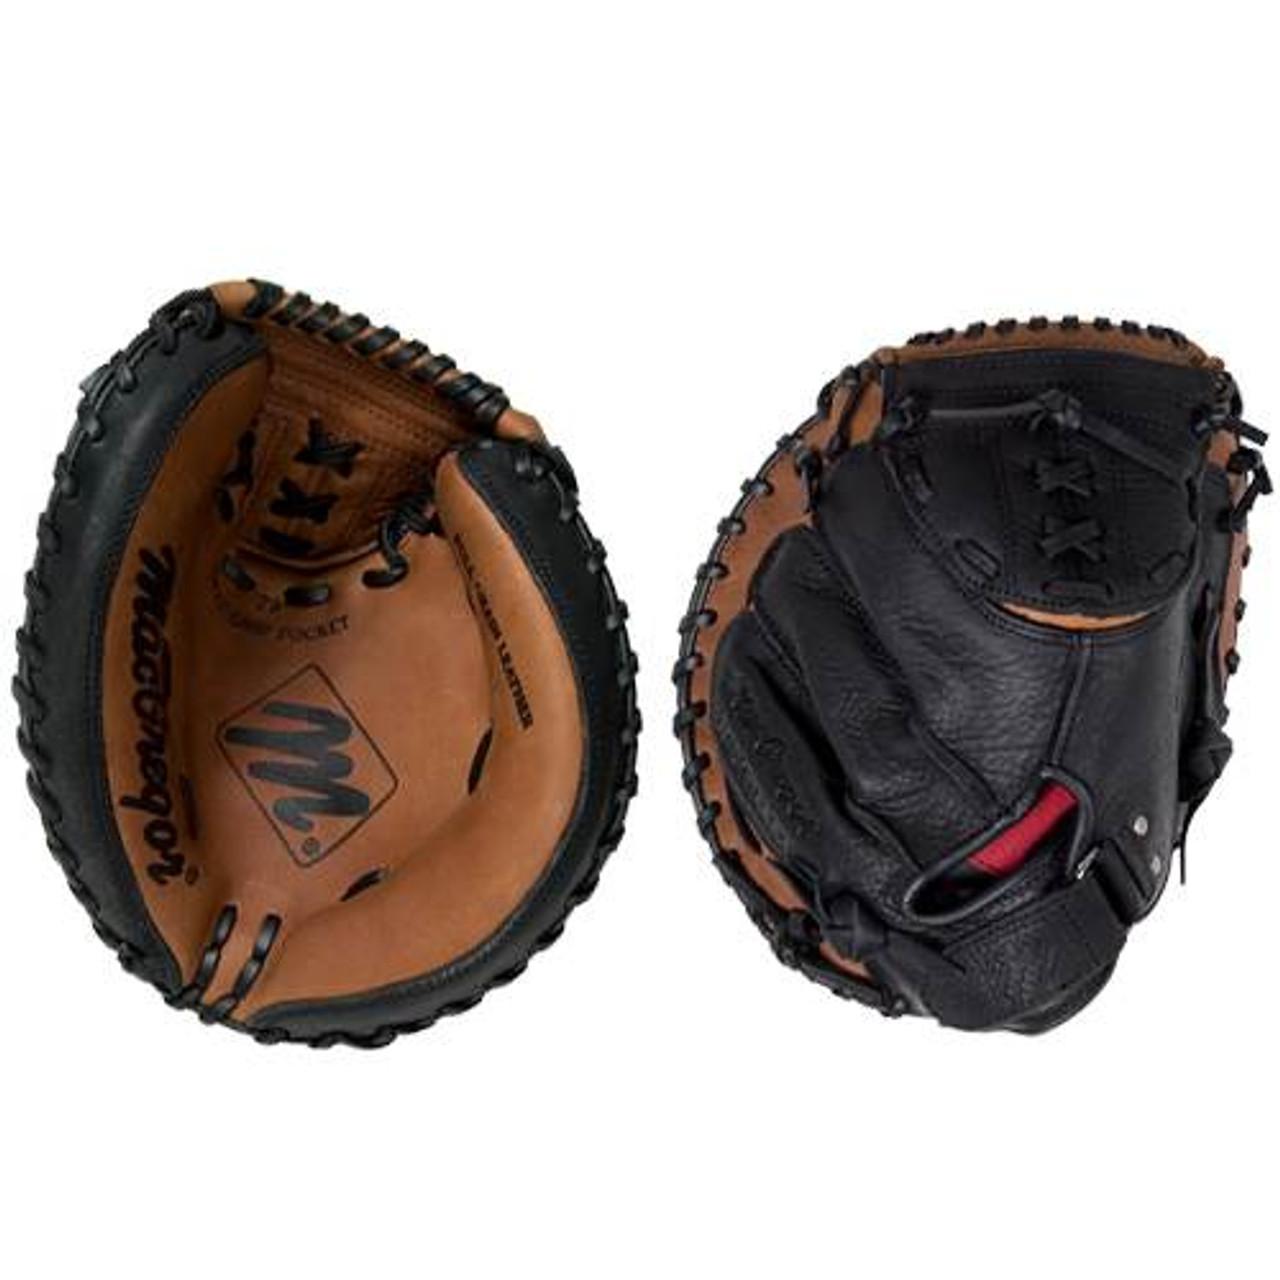 MacGregor Jr Series Baseball Catchers Mitt - LHT